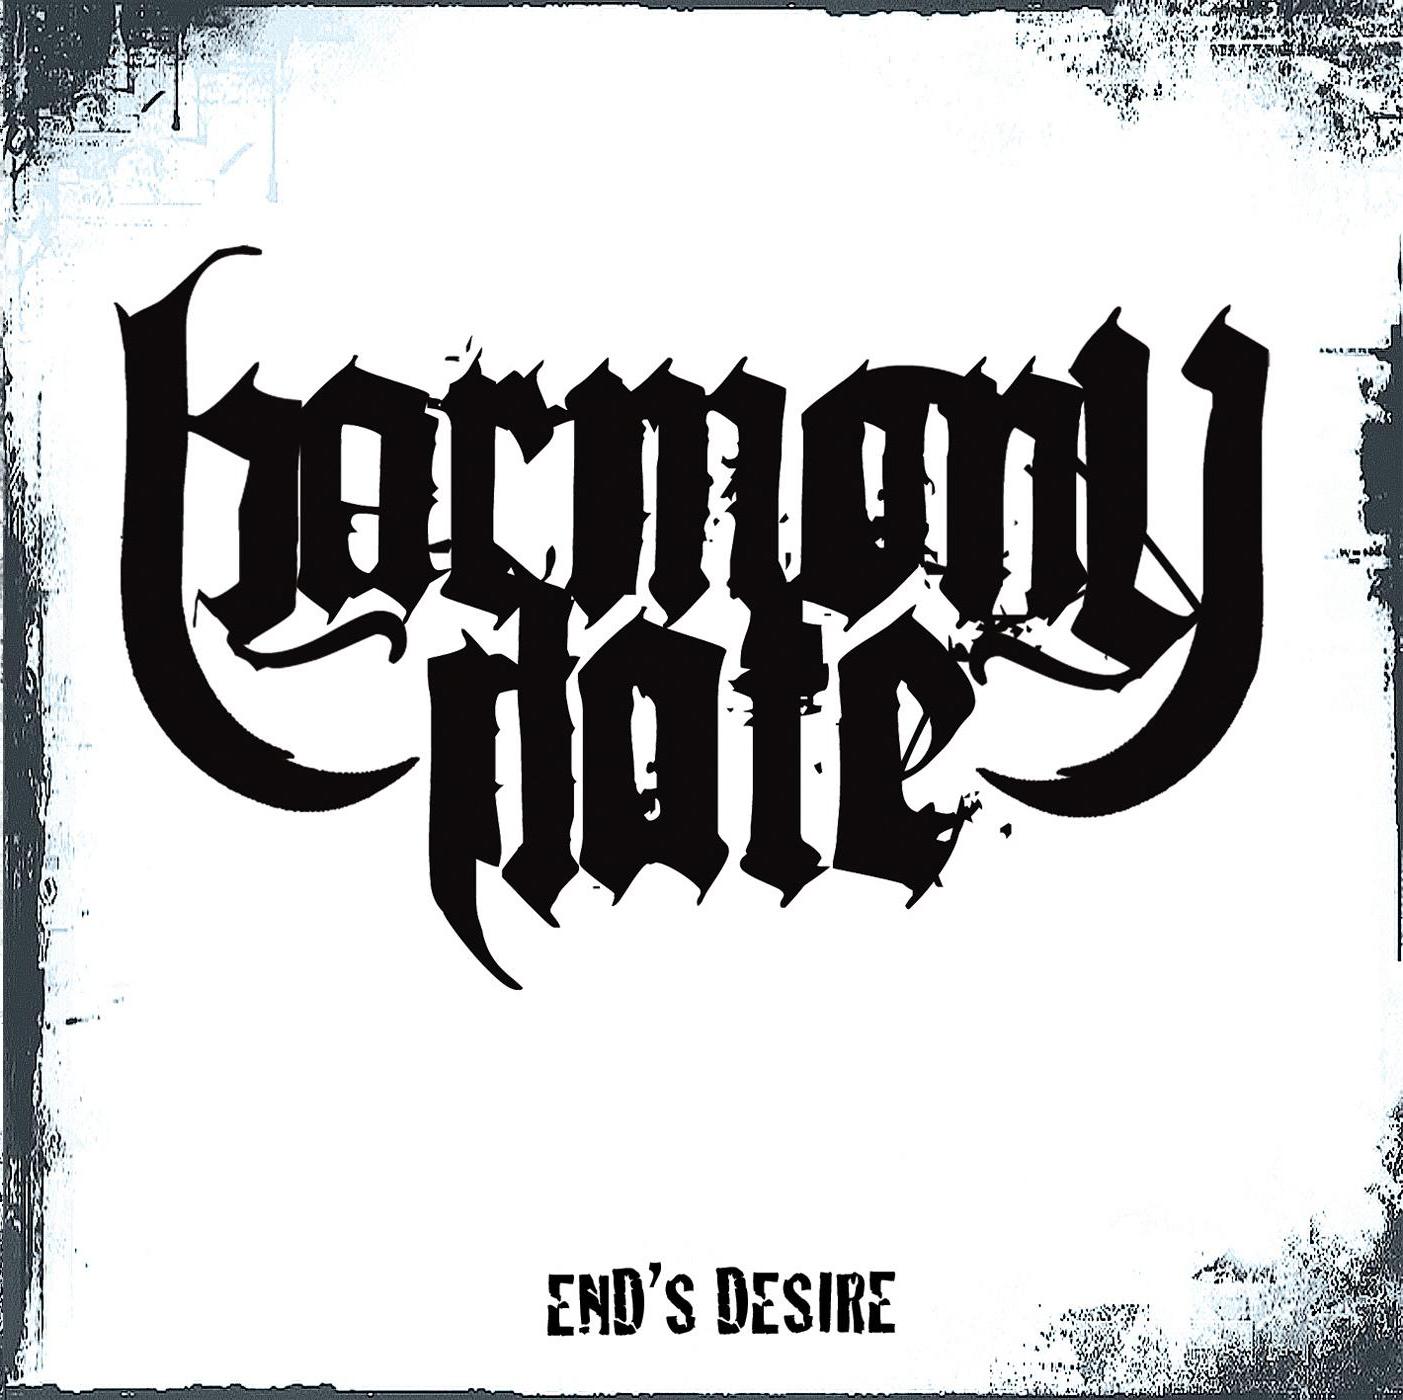 Ends Desire Harmony Hate